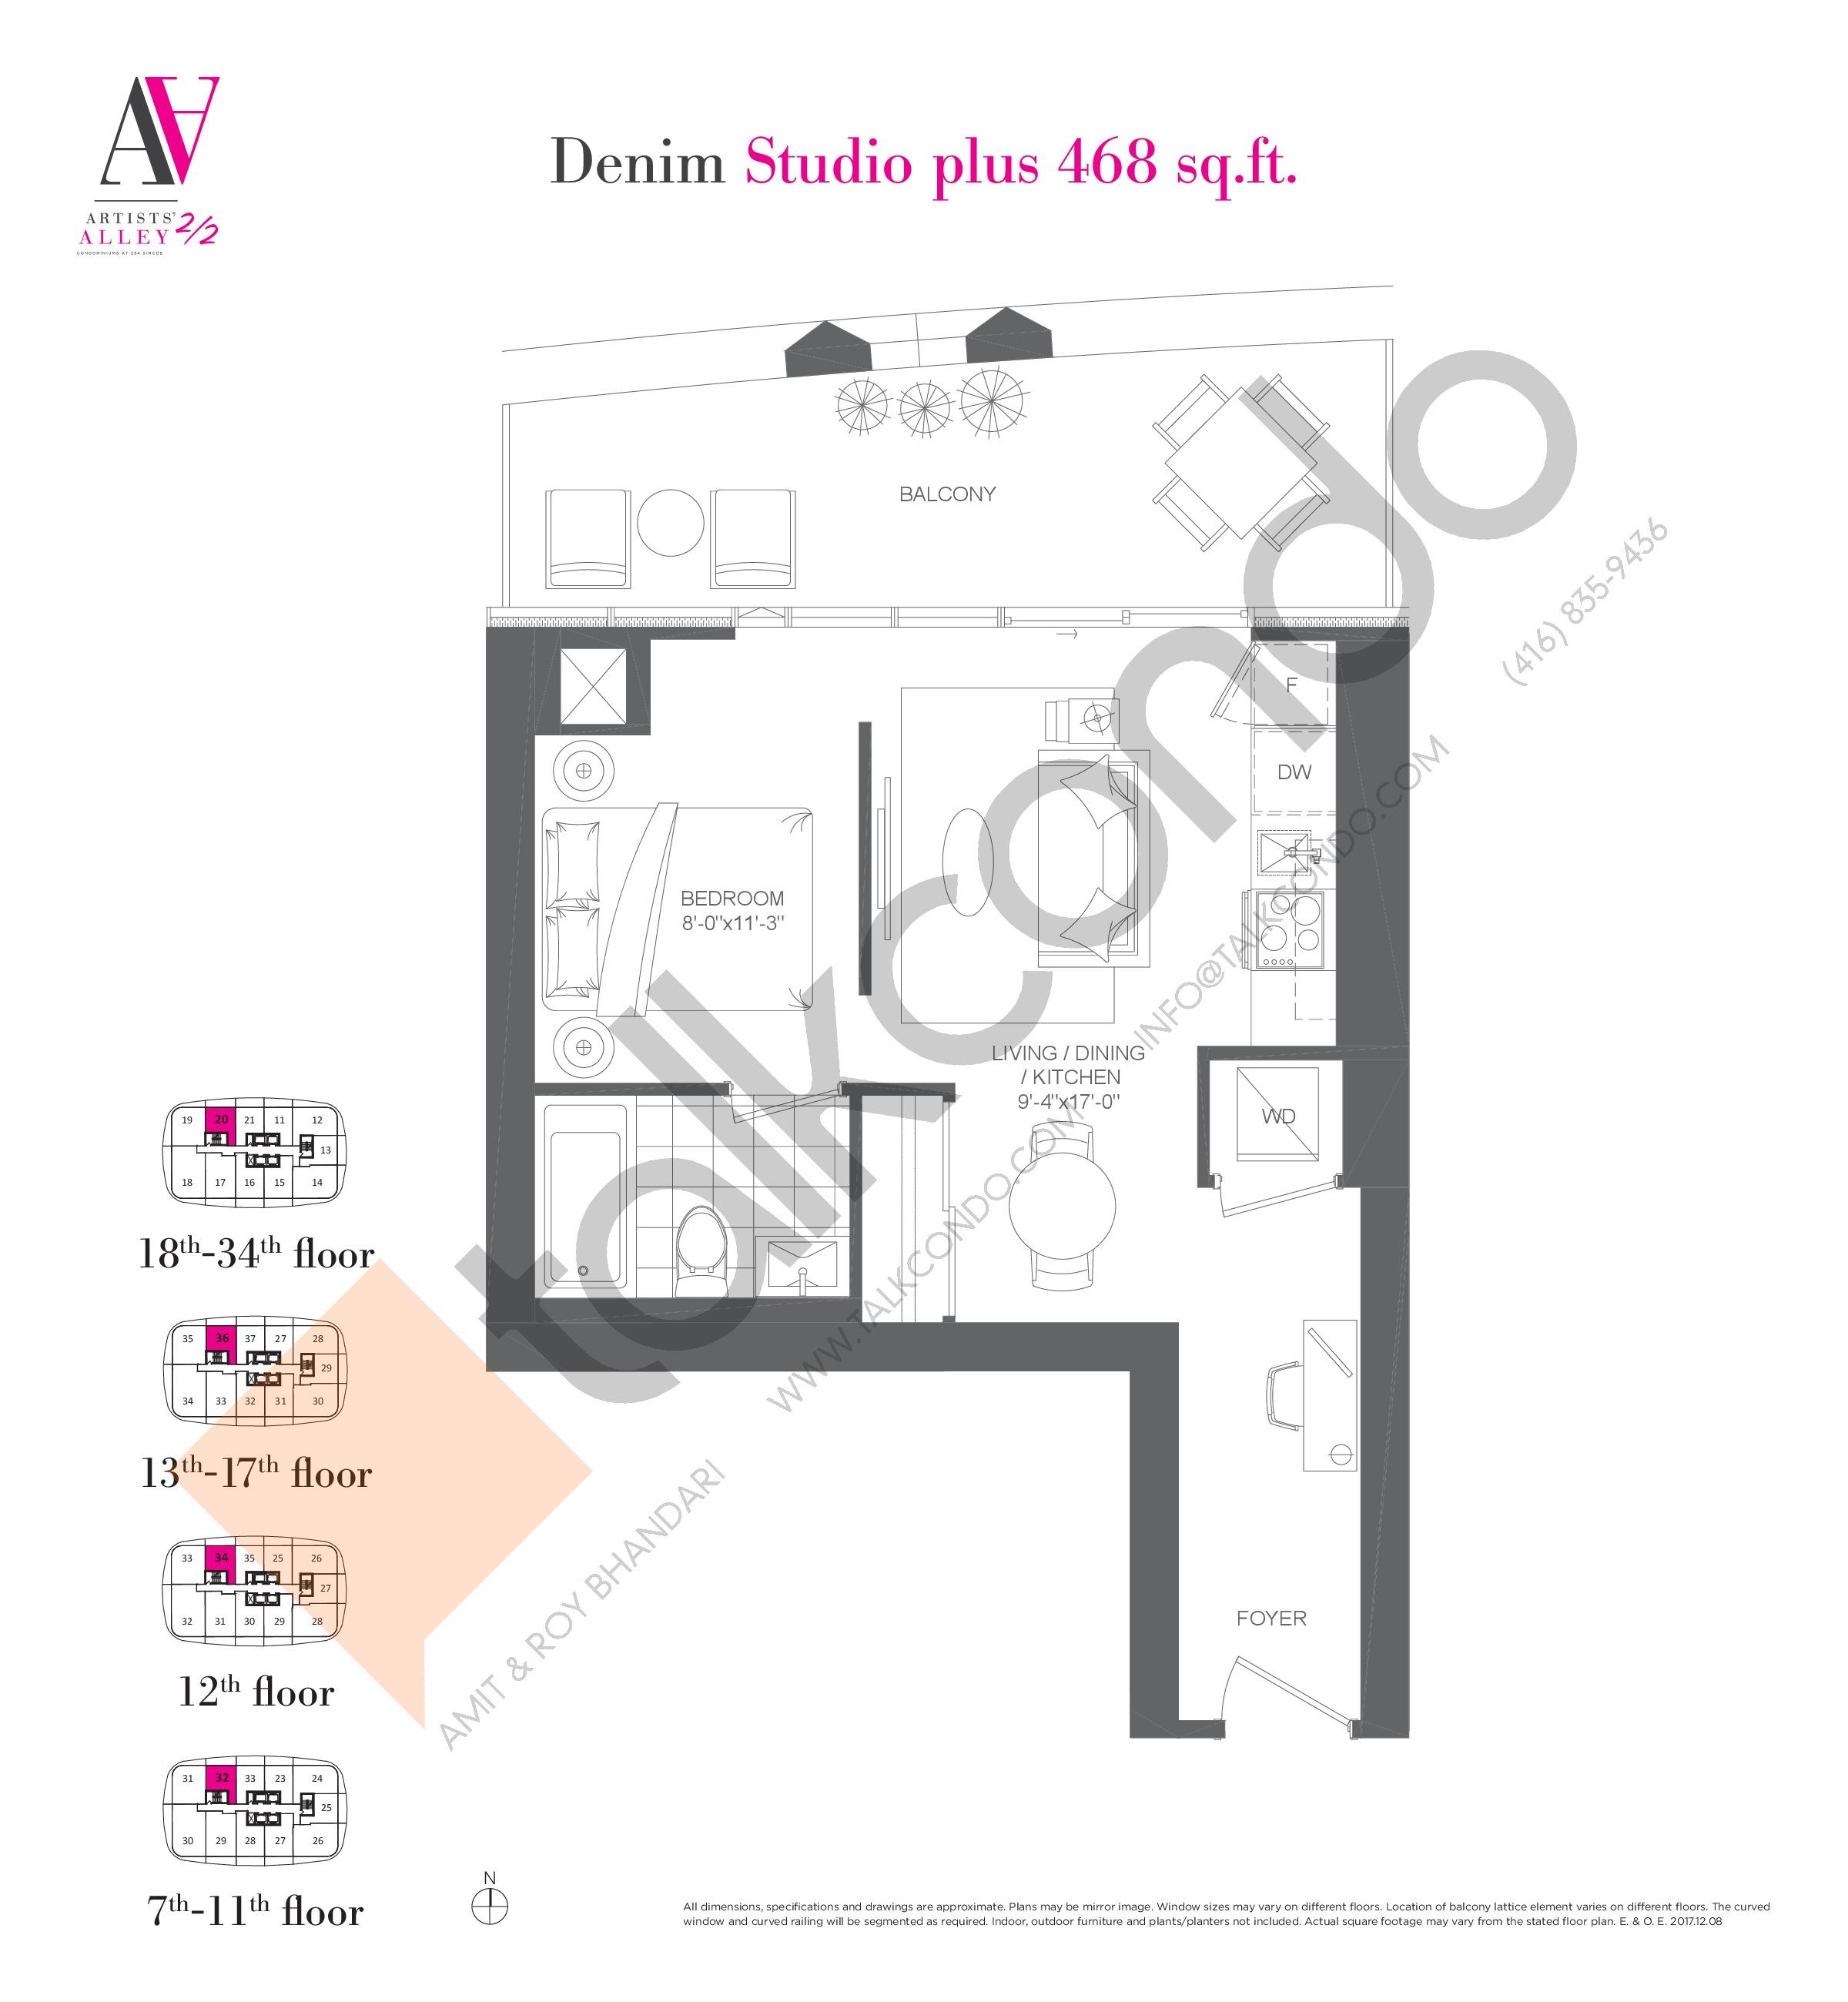 Denim Floor Plan at Artists' Alley 2 Condos - 468 sq.ft